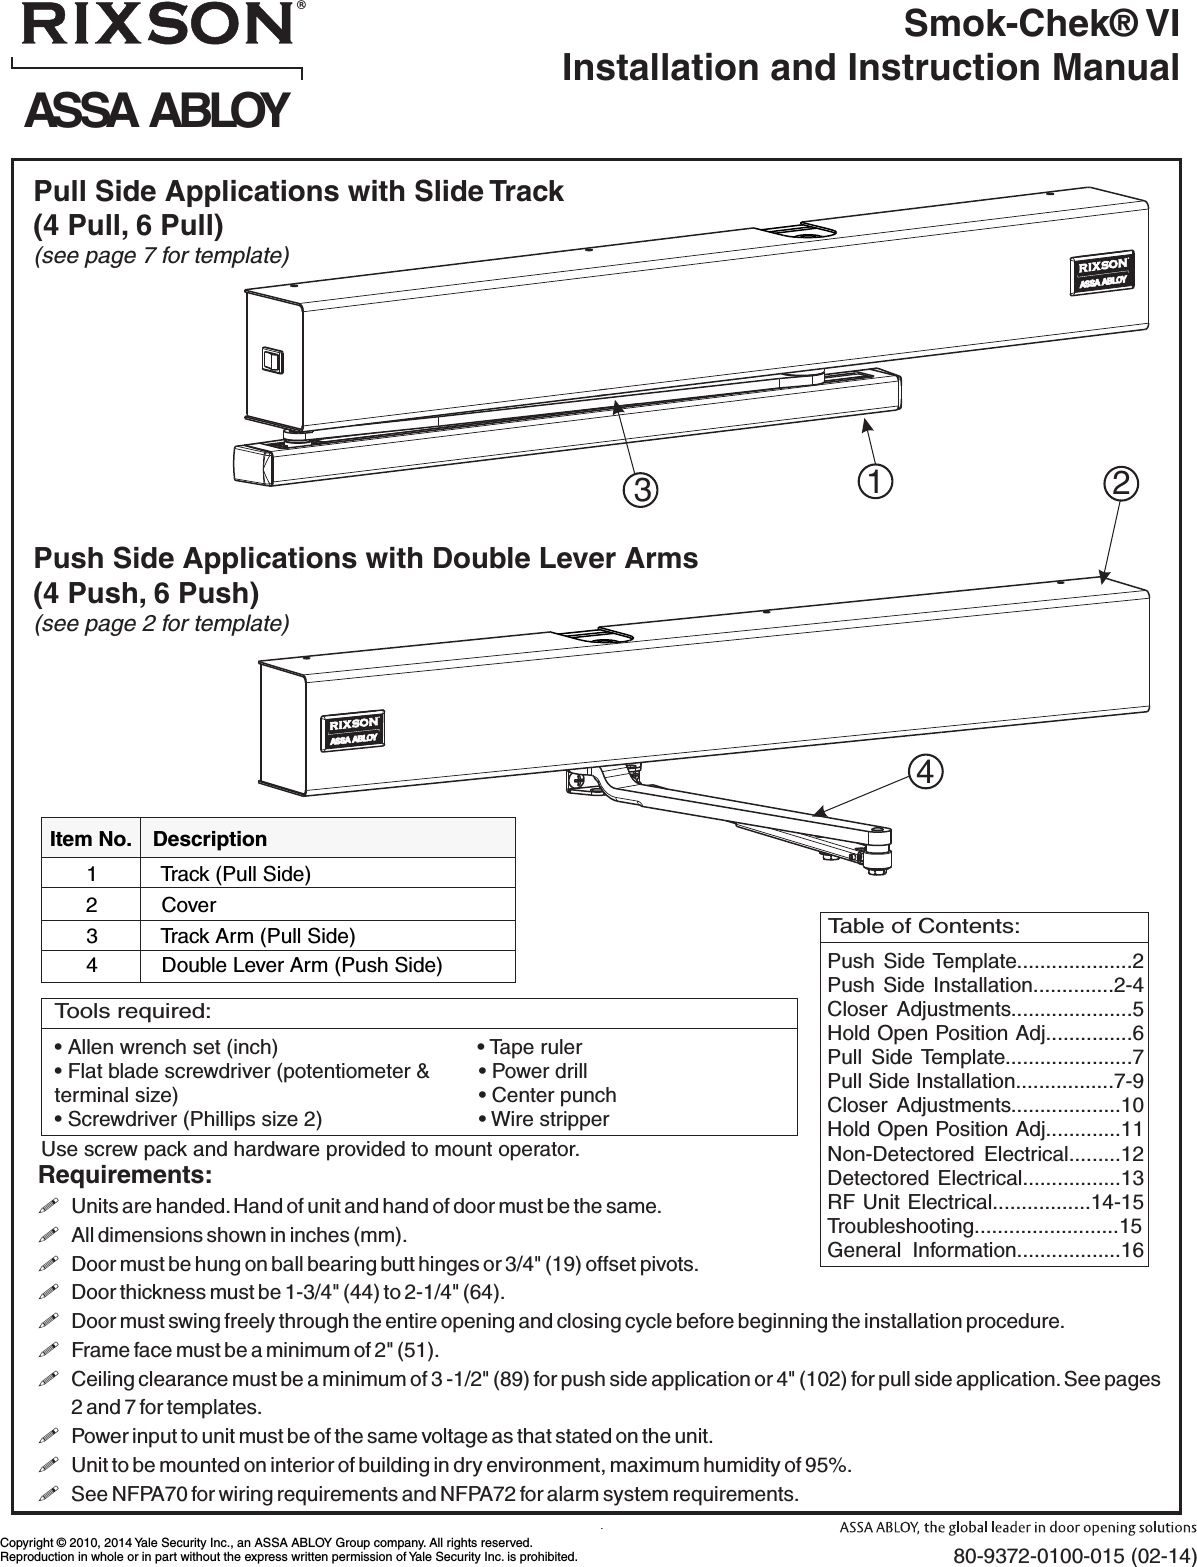 Rixson Smok Chek Vi Installation And Instruction Manual 80 9372 0100 015